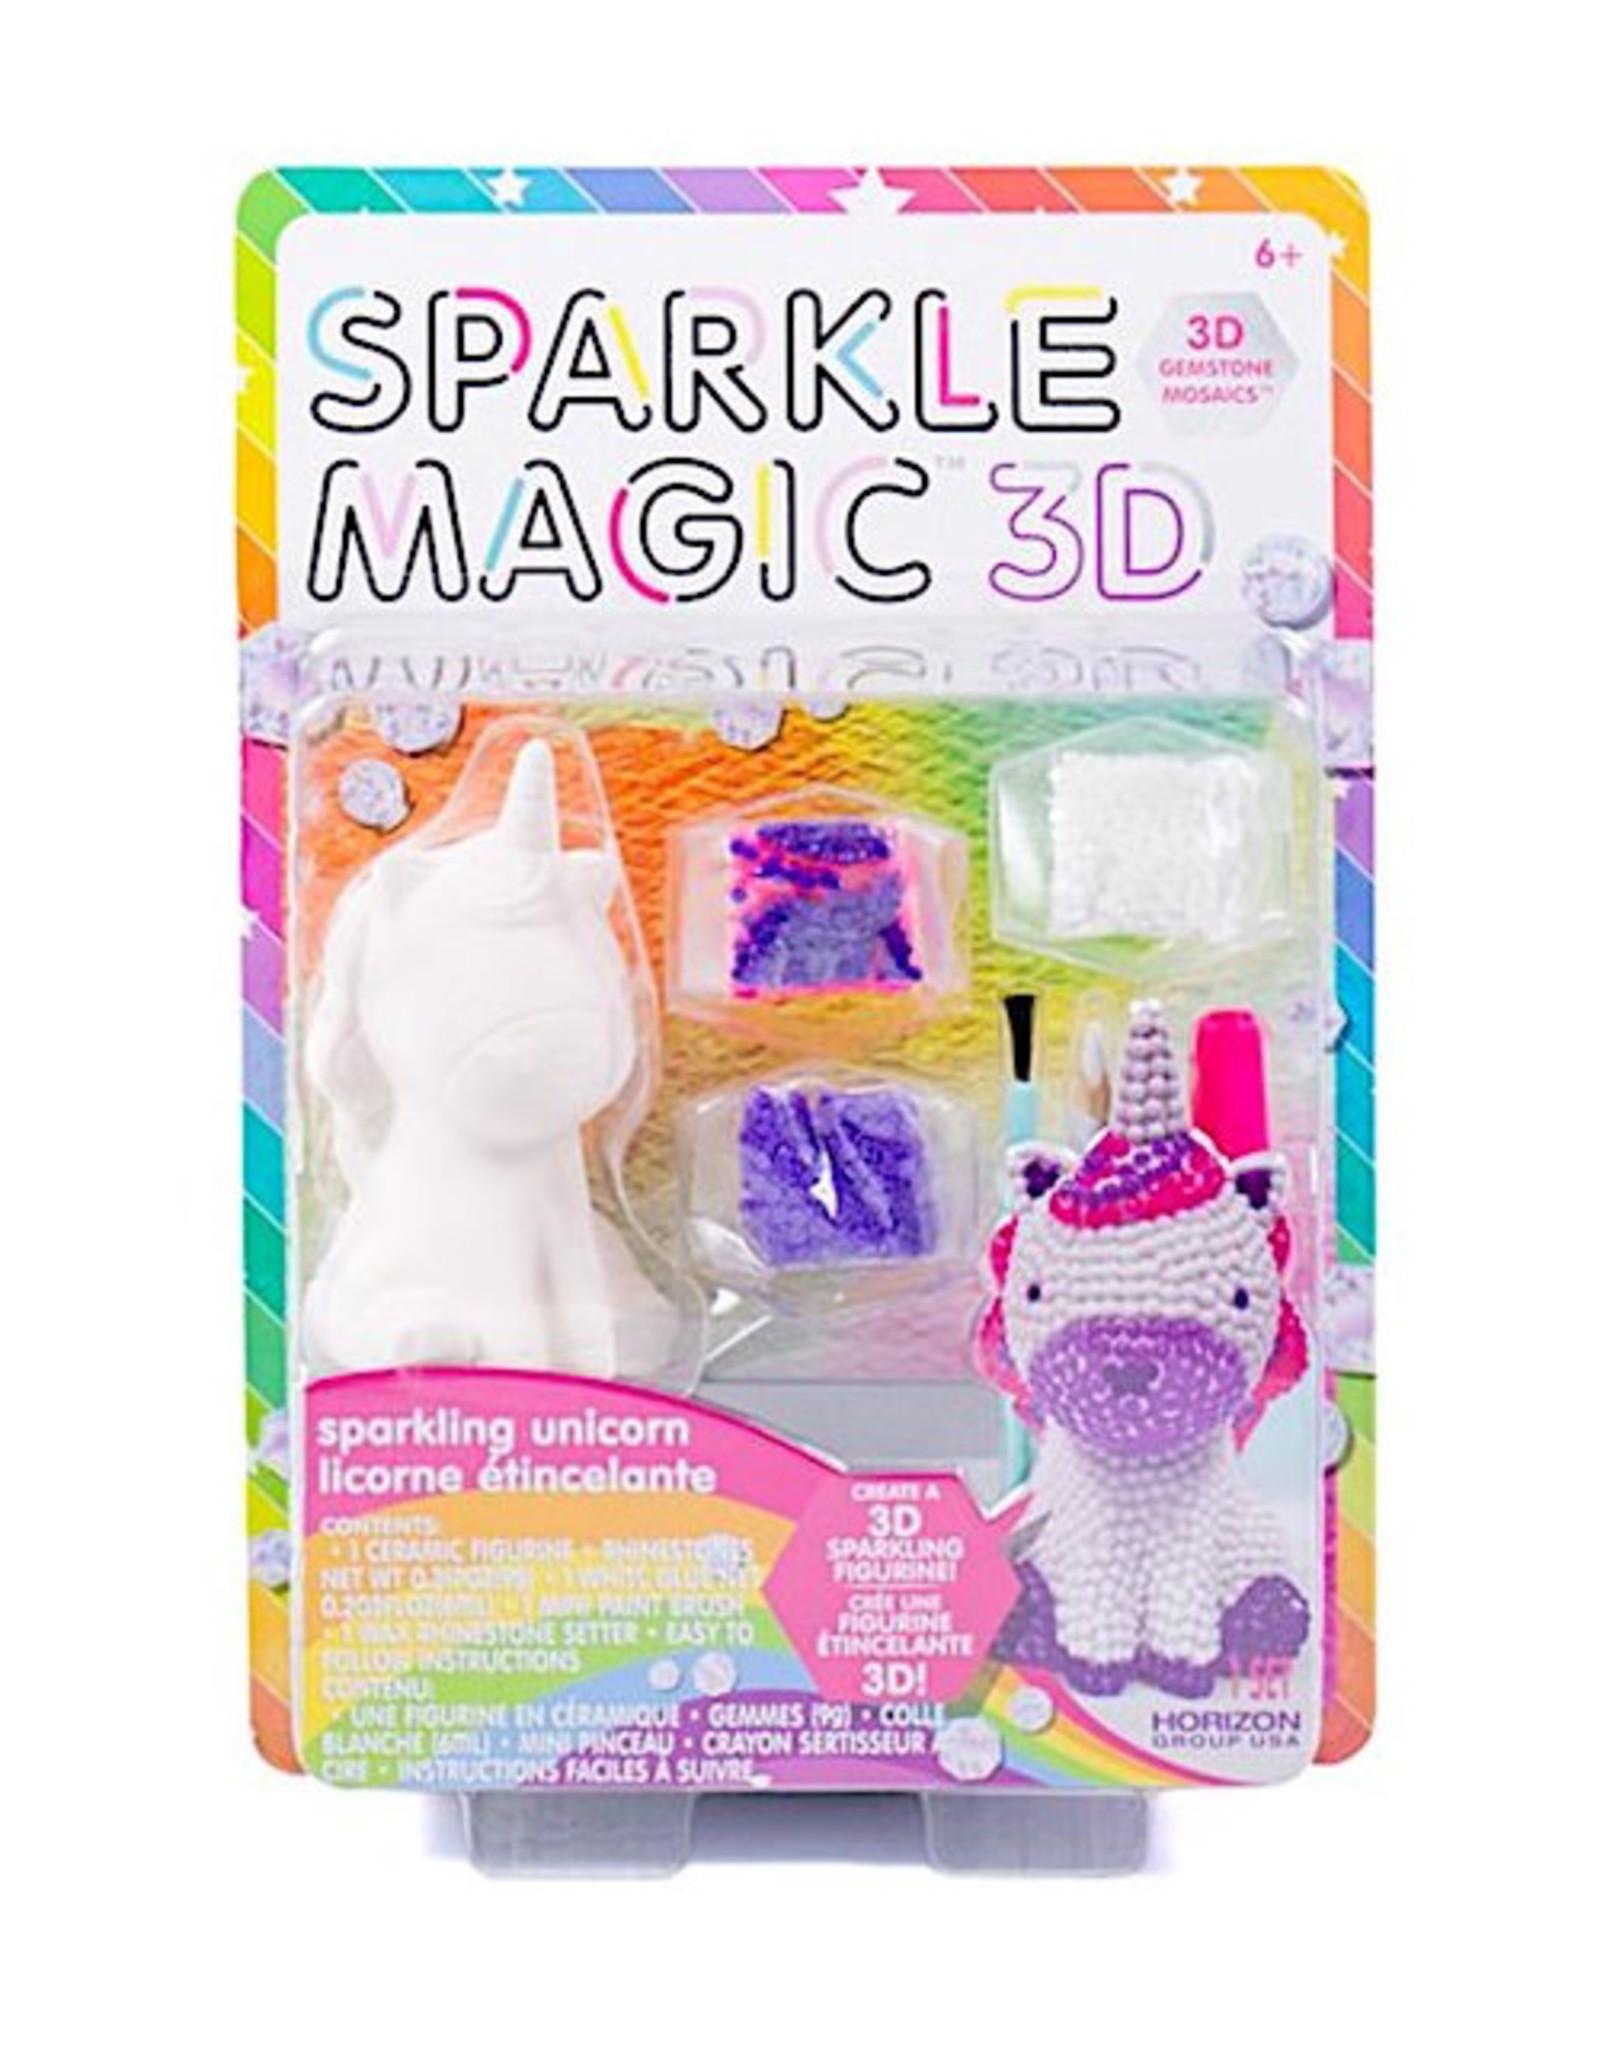 Sparkle Magic 3D - Unicorn